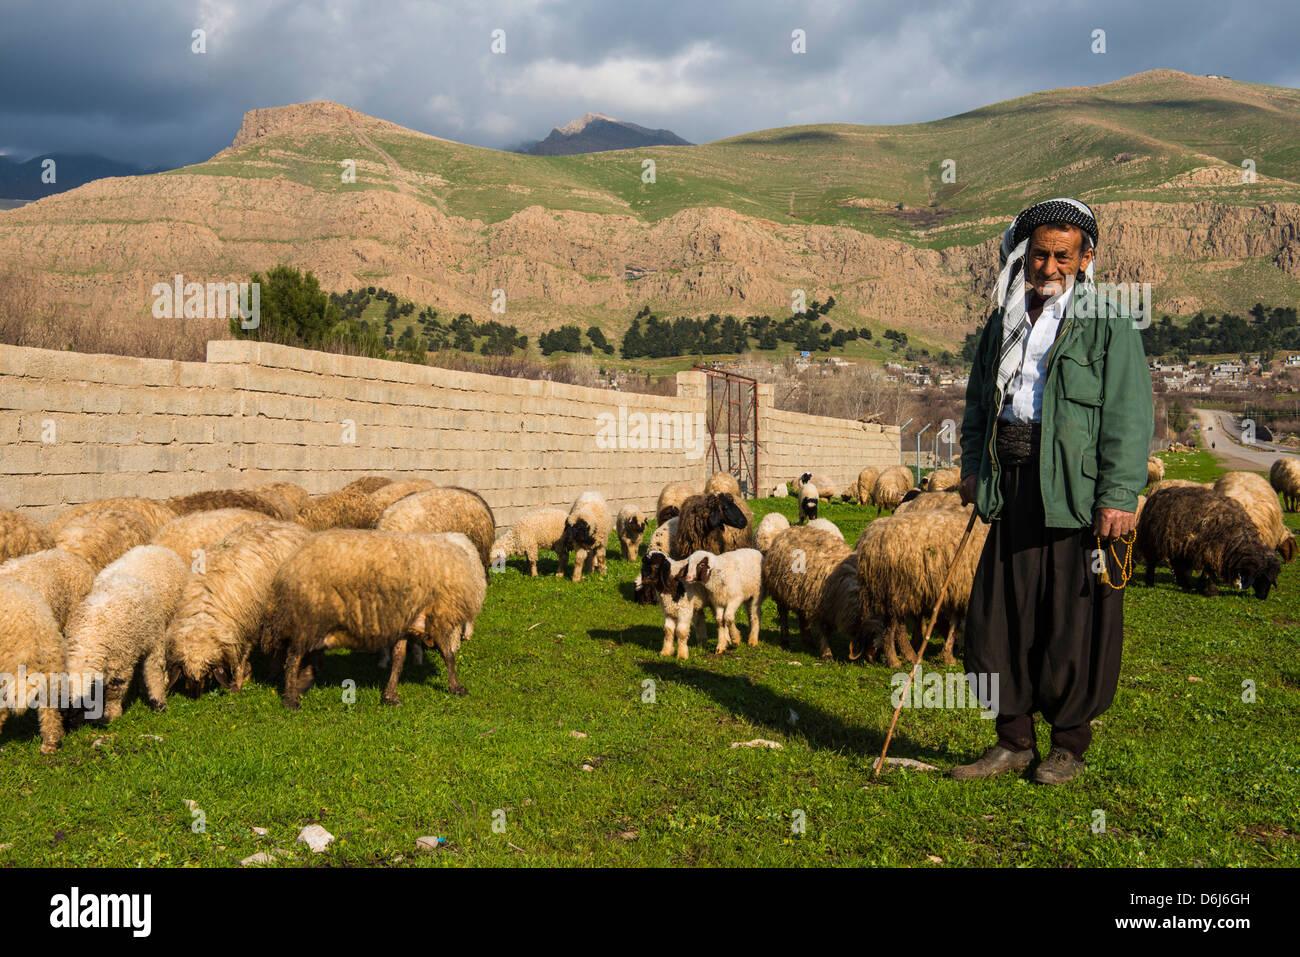 Shepherd with his herd of sheep in Ahmedawa on the border of Iran, Iraq Kurdistan, Iraq, Middle East - Stock Image